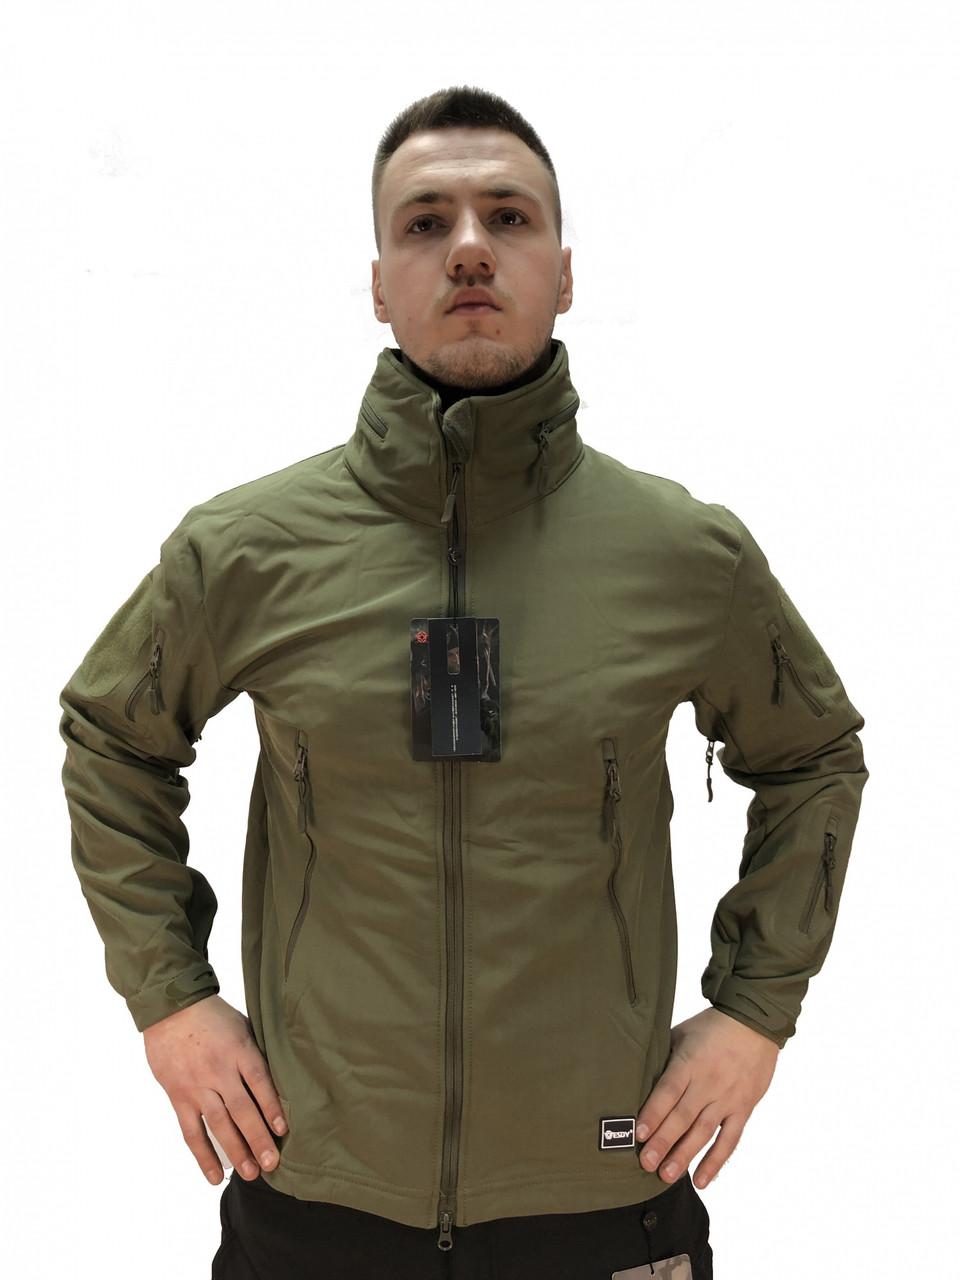 Тактична куртка Softshell Tactic 02. ESDY. Капюшон ховається. Олива